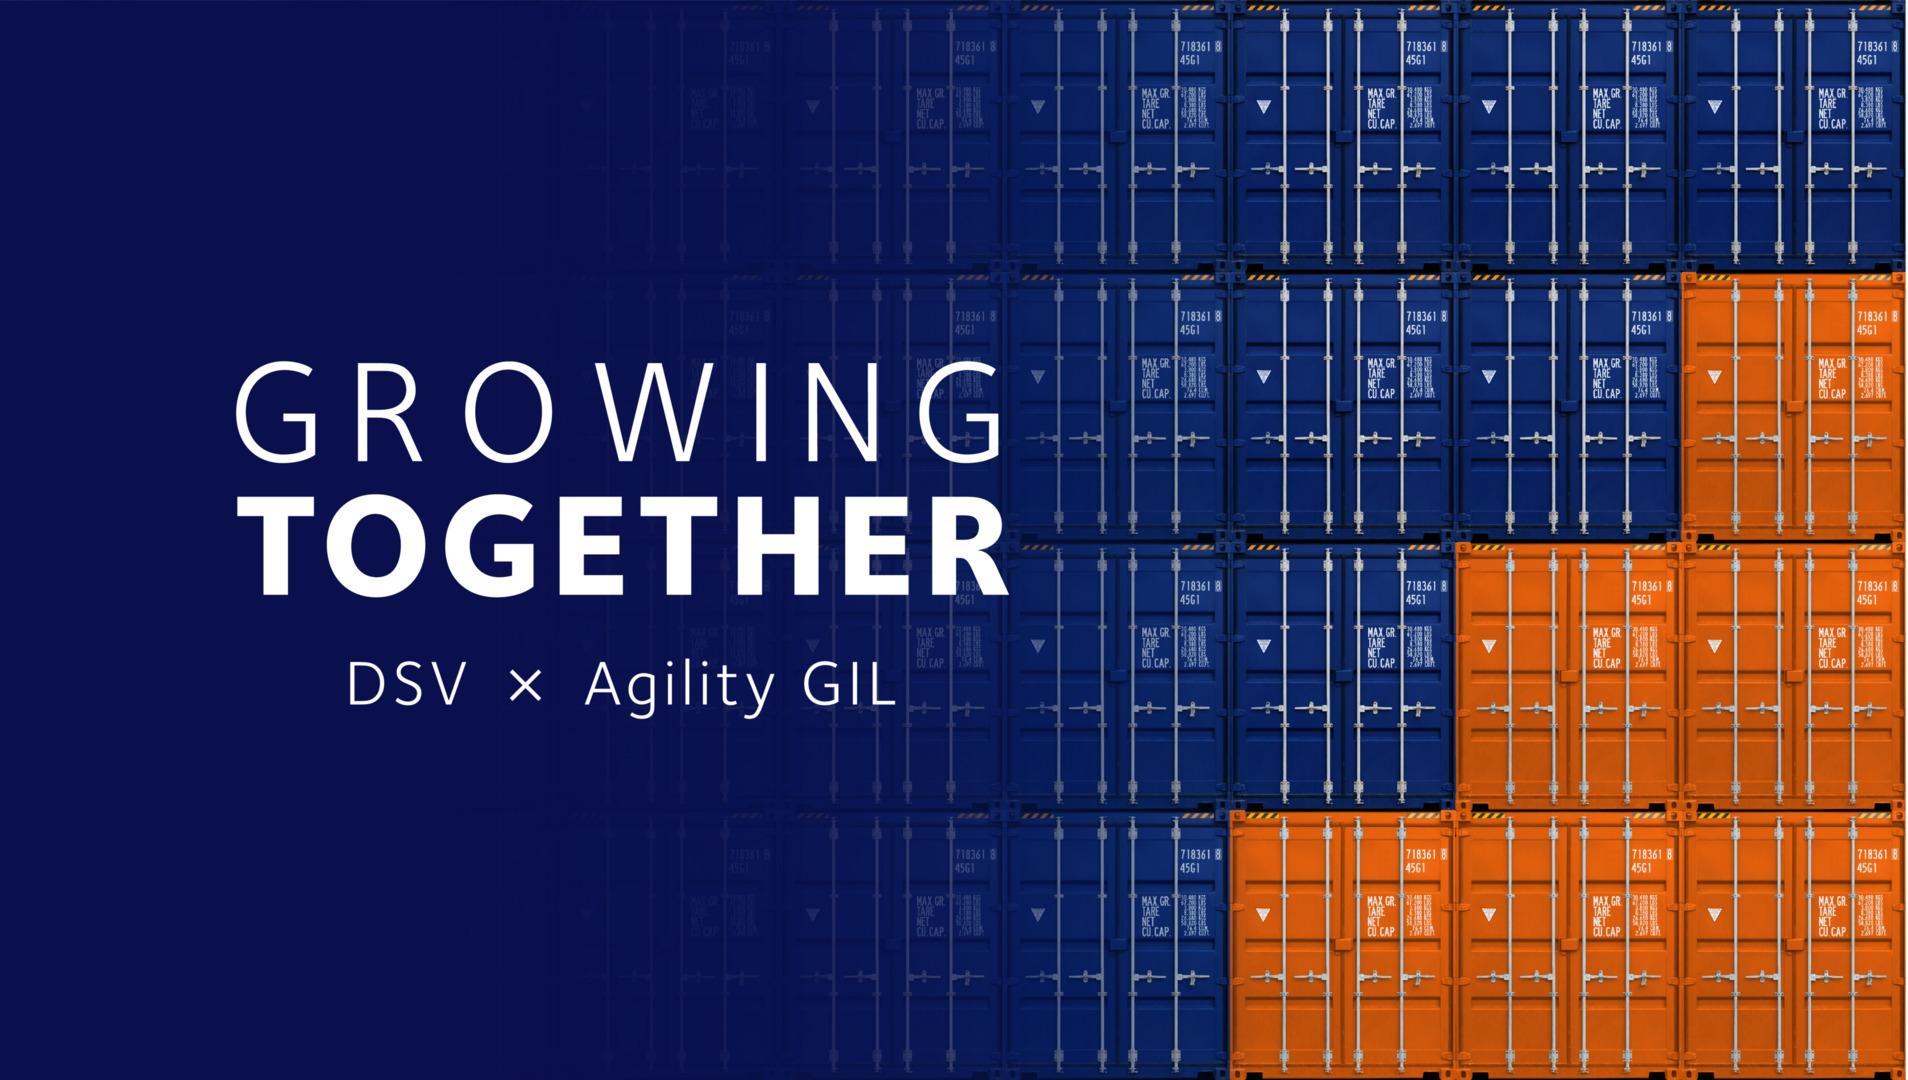 DSV & Agility GIL